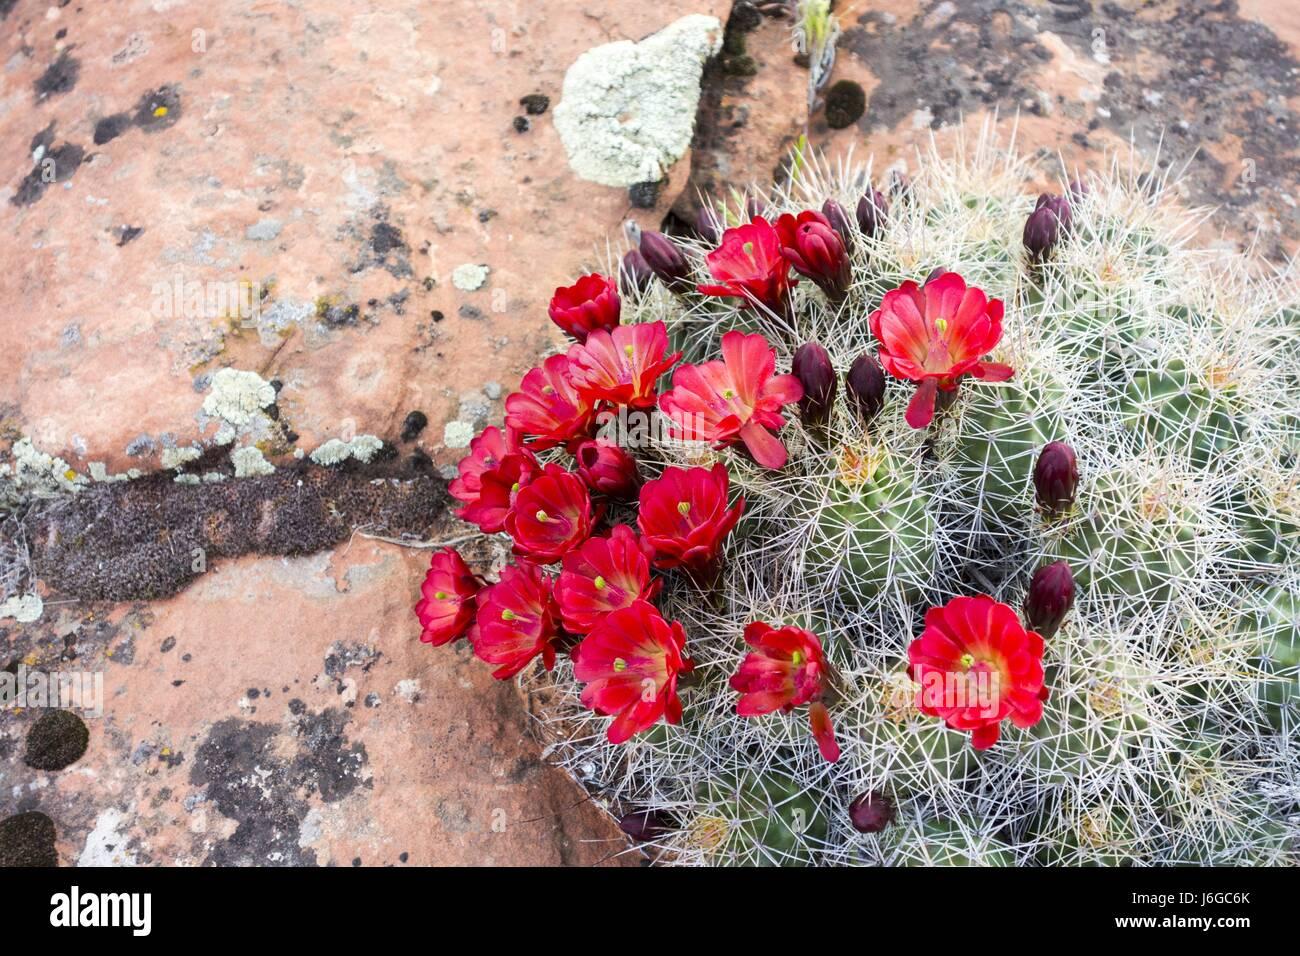 Desert Cactus Flower Bloom during Spring in South Utah - Stock Image